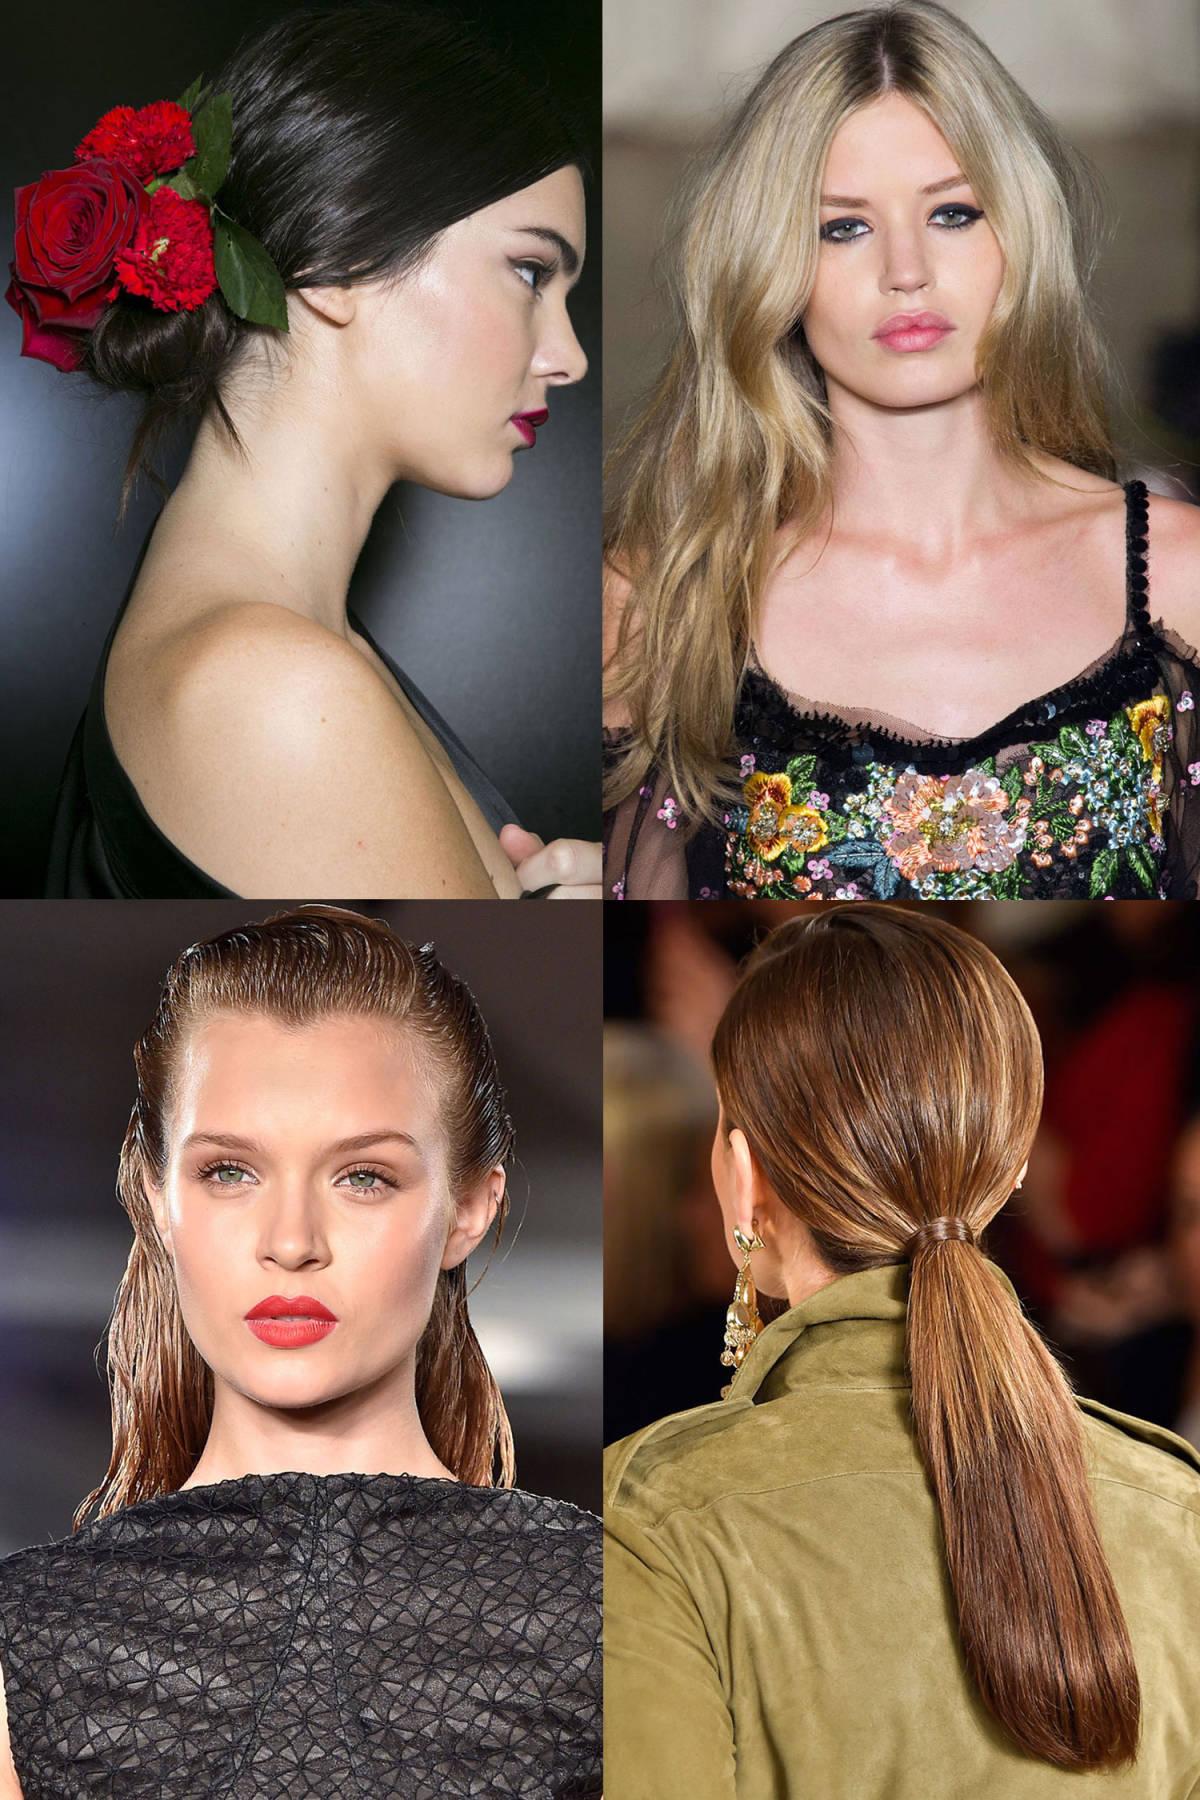 Awe Inspiring Best Hair Trends Spring 2015 Top Hairstyles For Spring As Seen Hairstyles For Women Draintrainus